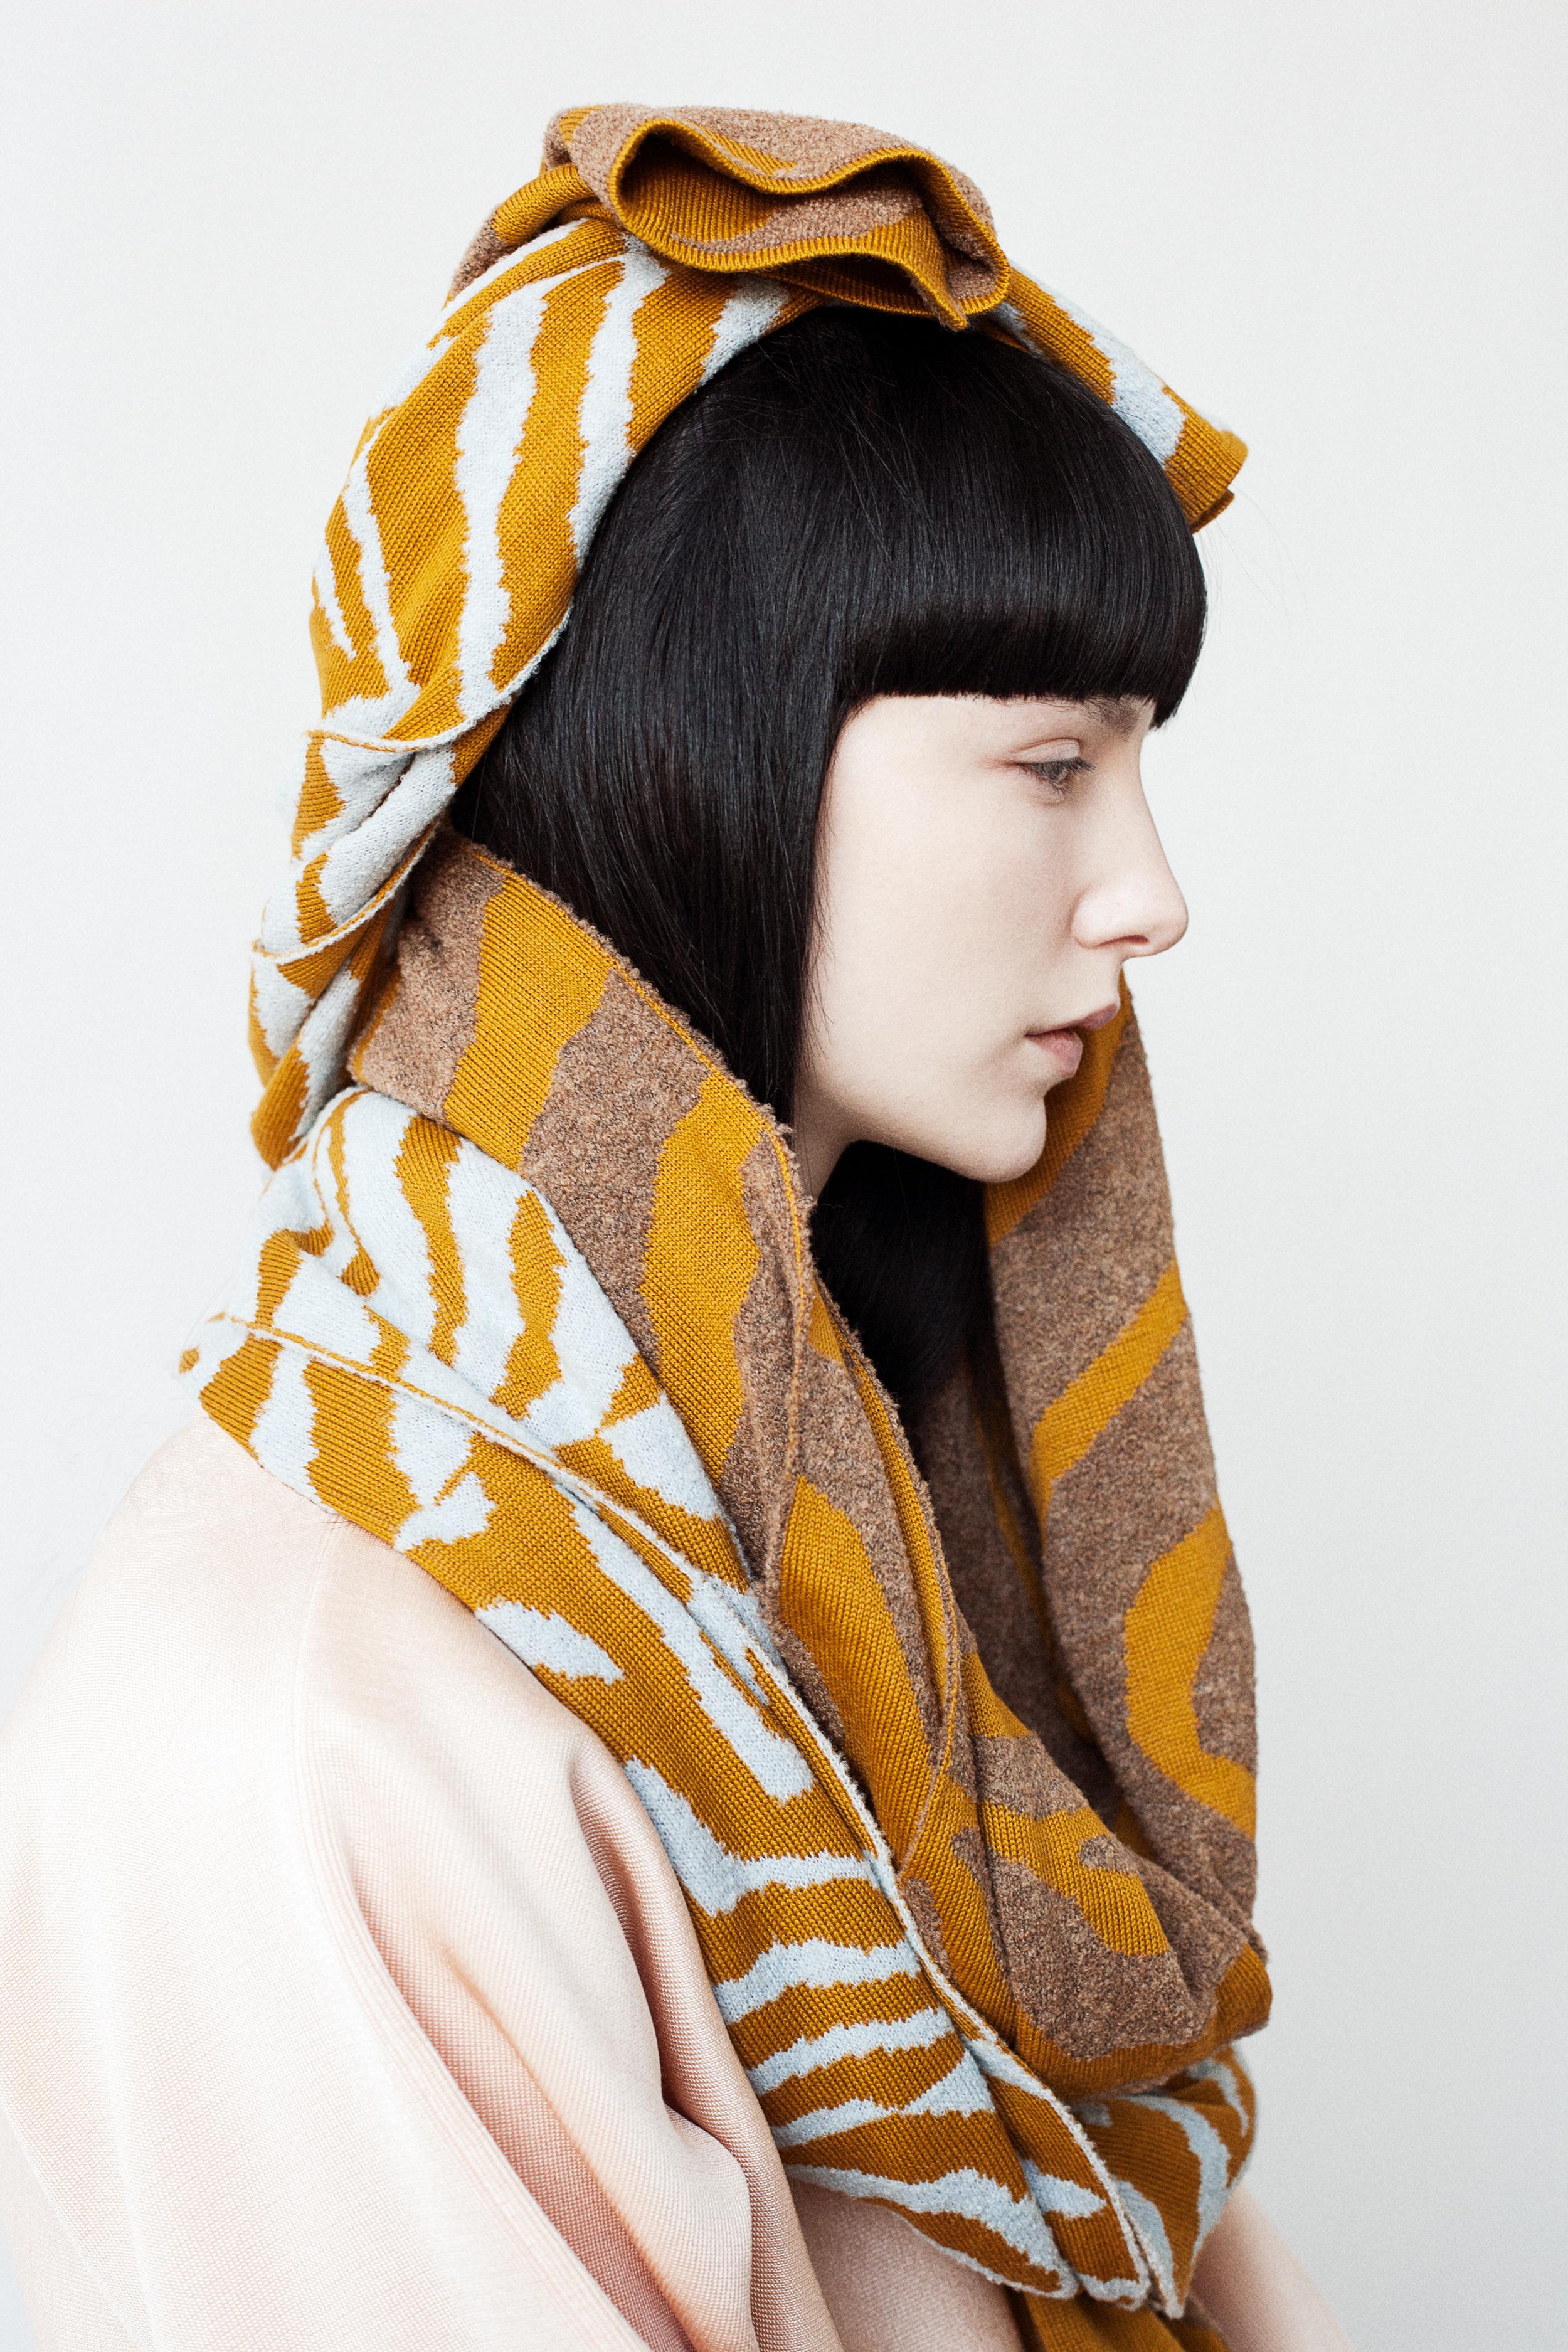 Irish knitwear designer Mary Callan